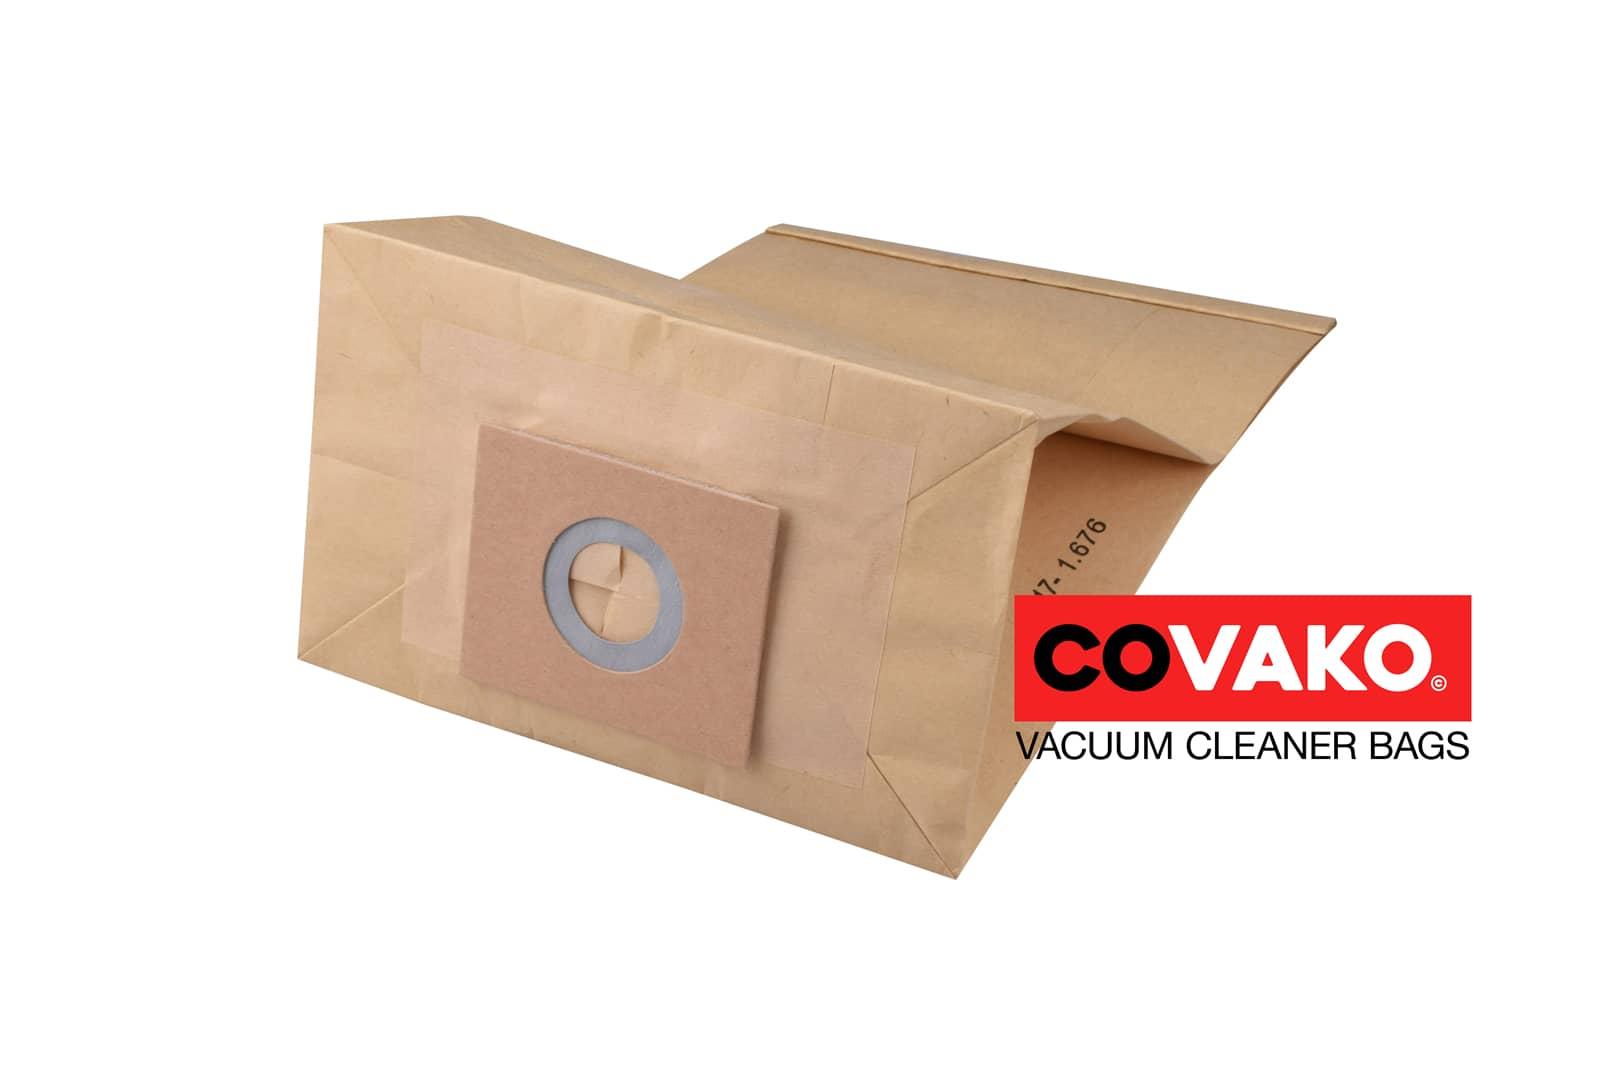 I-vac Dryver 15R / Papier - I-vac Staubsaugerbeutel